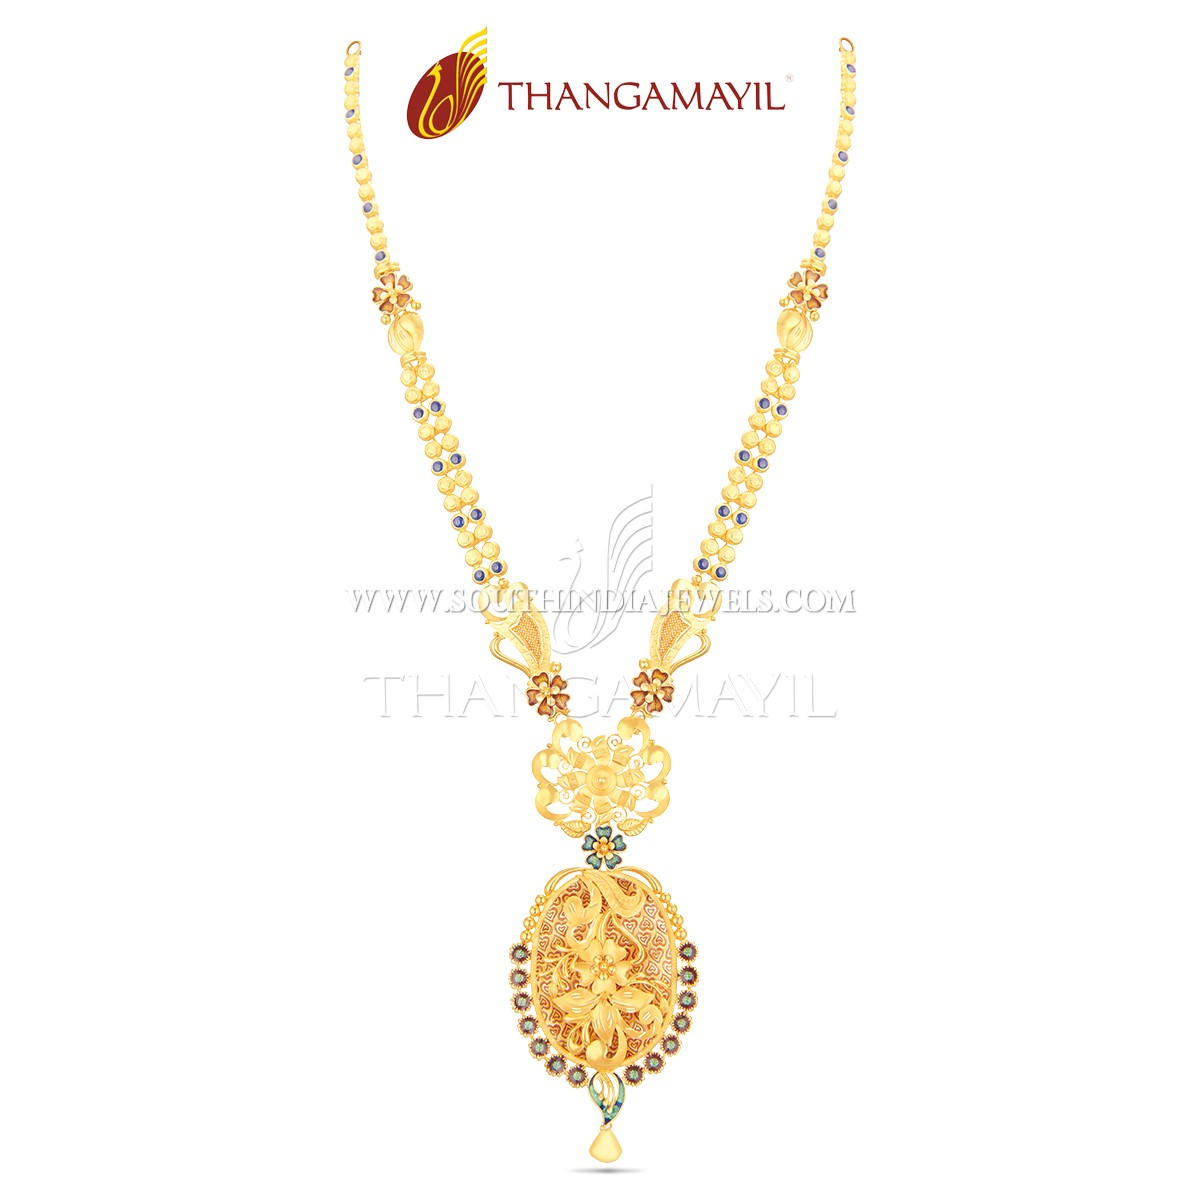 Gorgeous Gold Malai From Thanamayil Jewellery